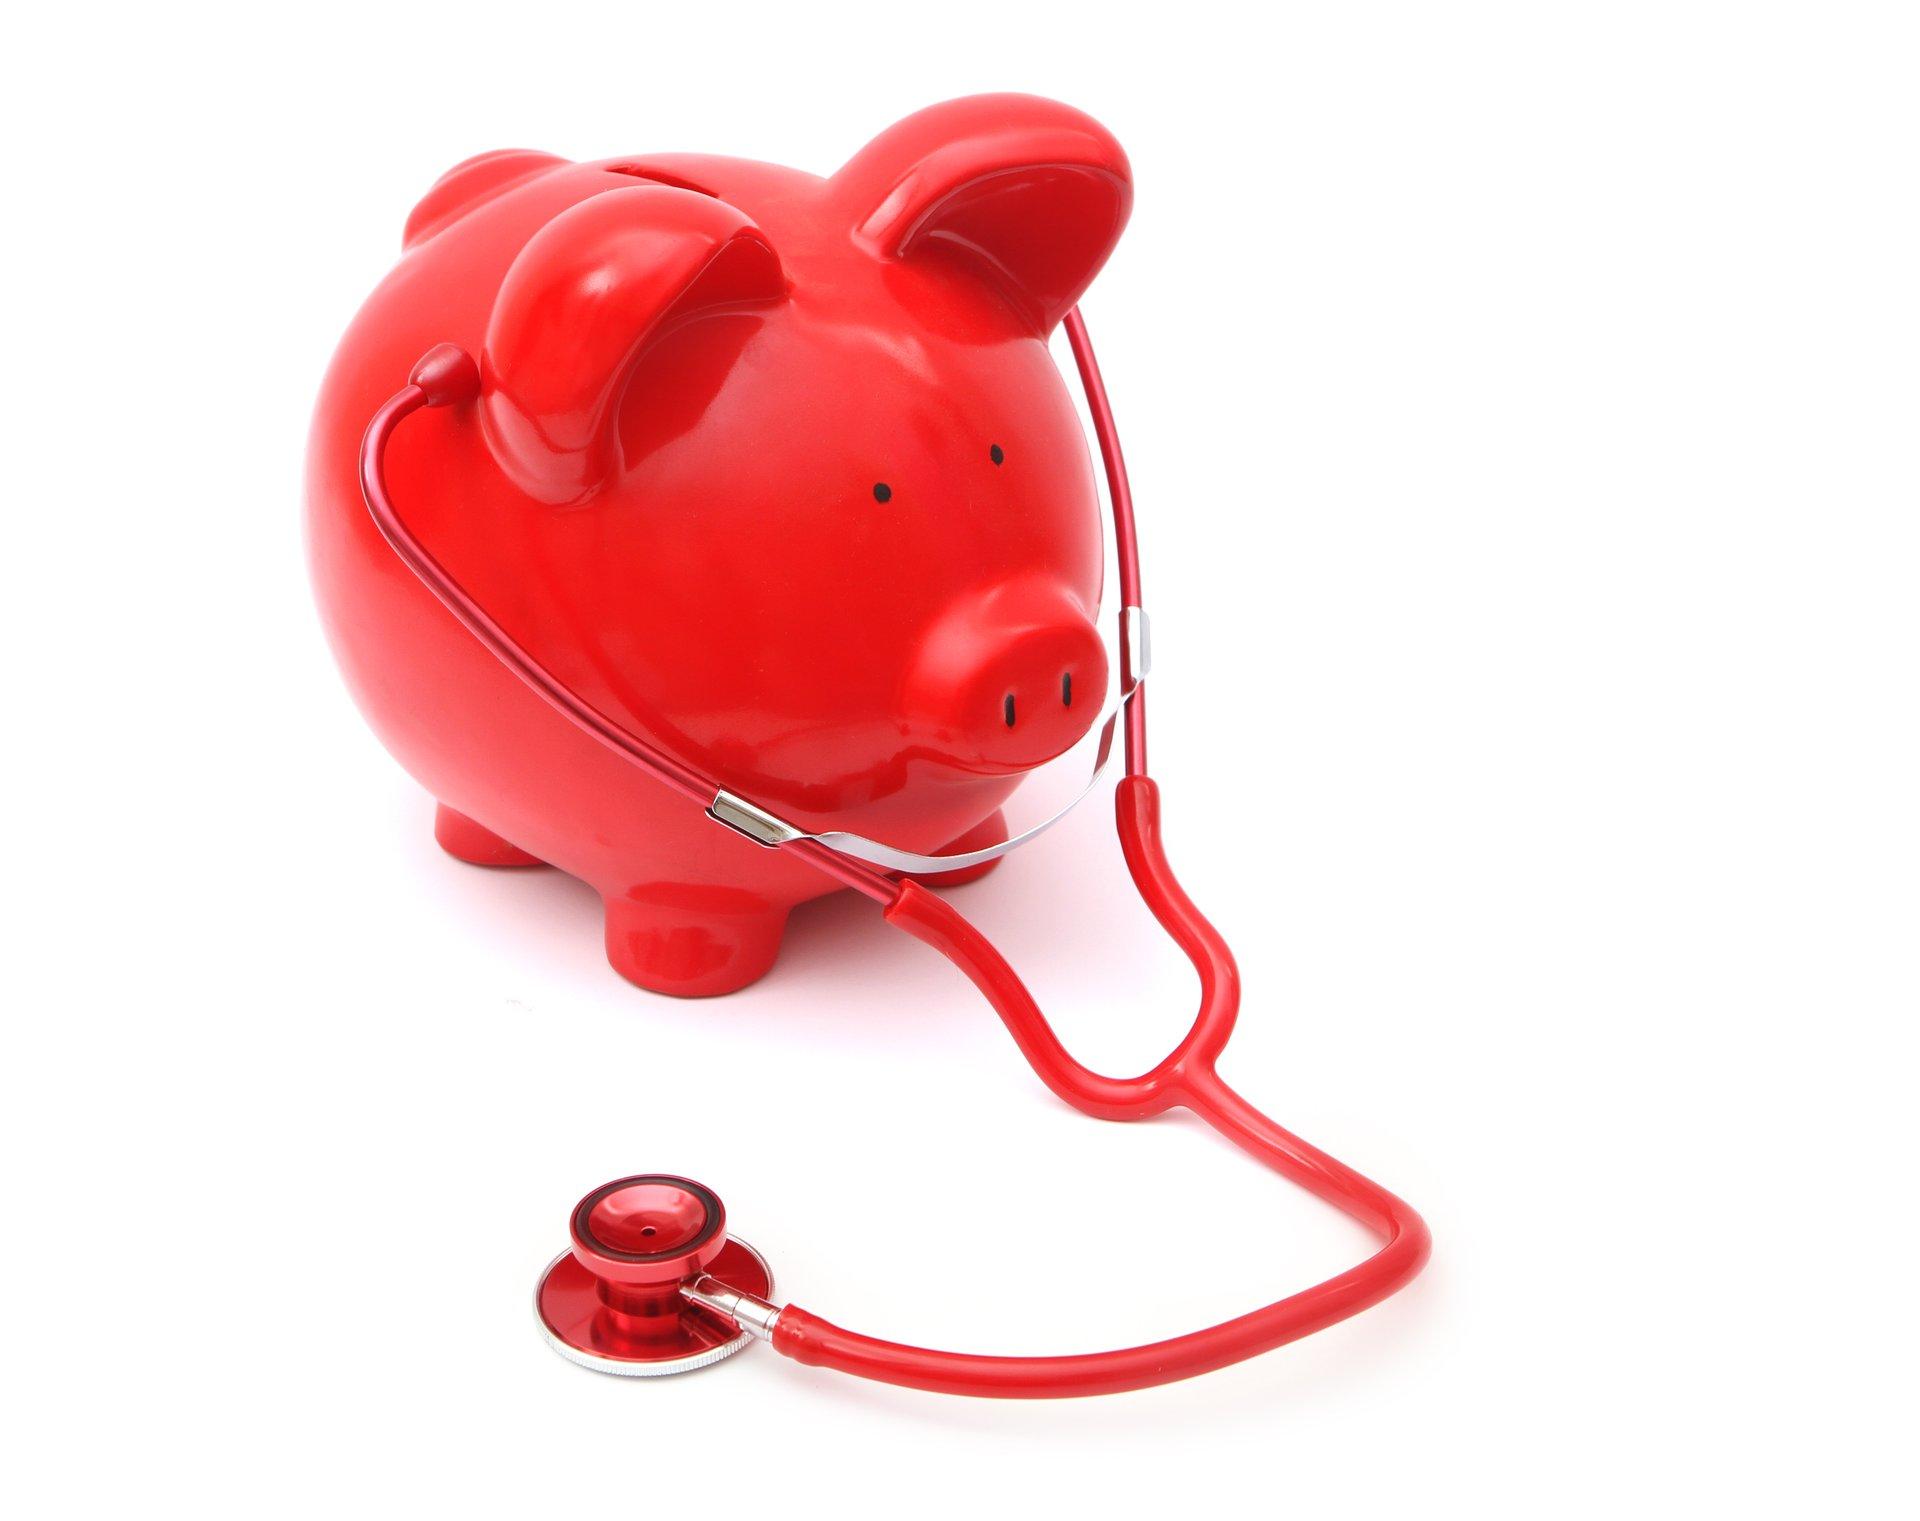 Piggy Bank w Stethoscope